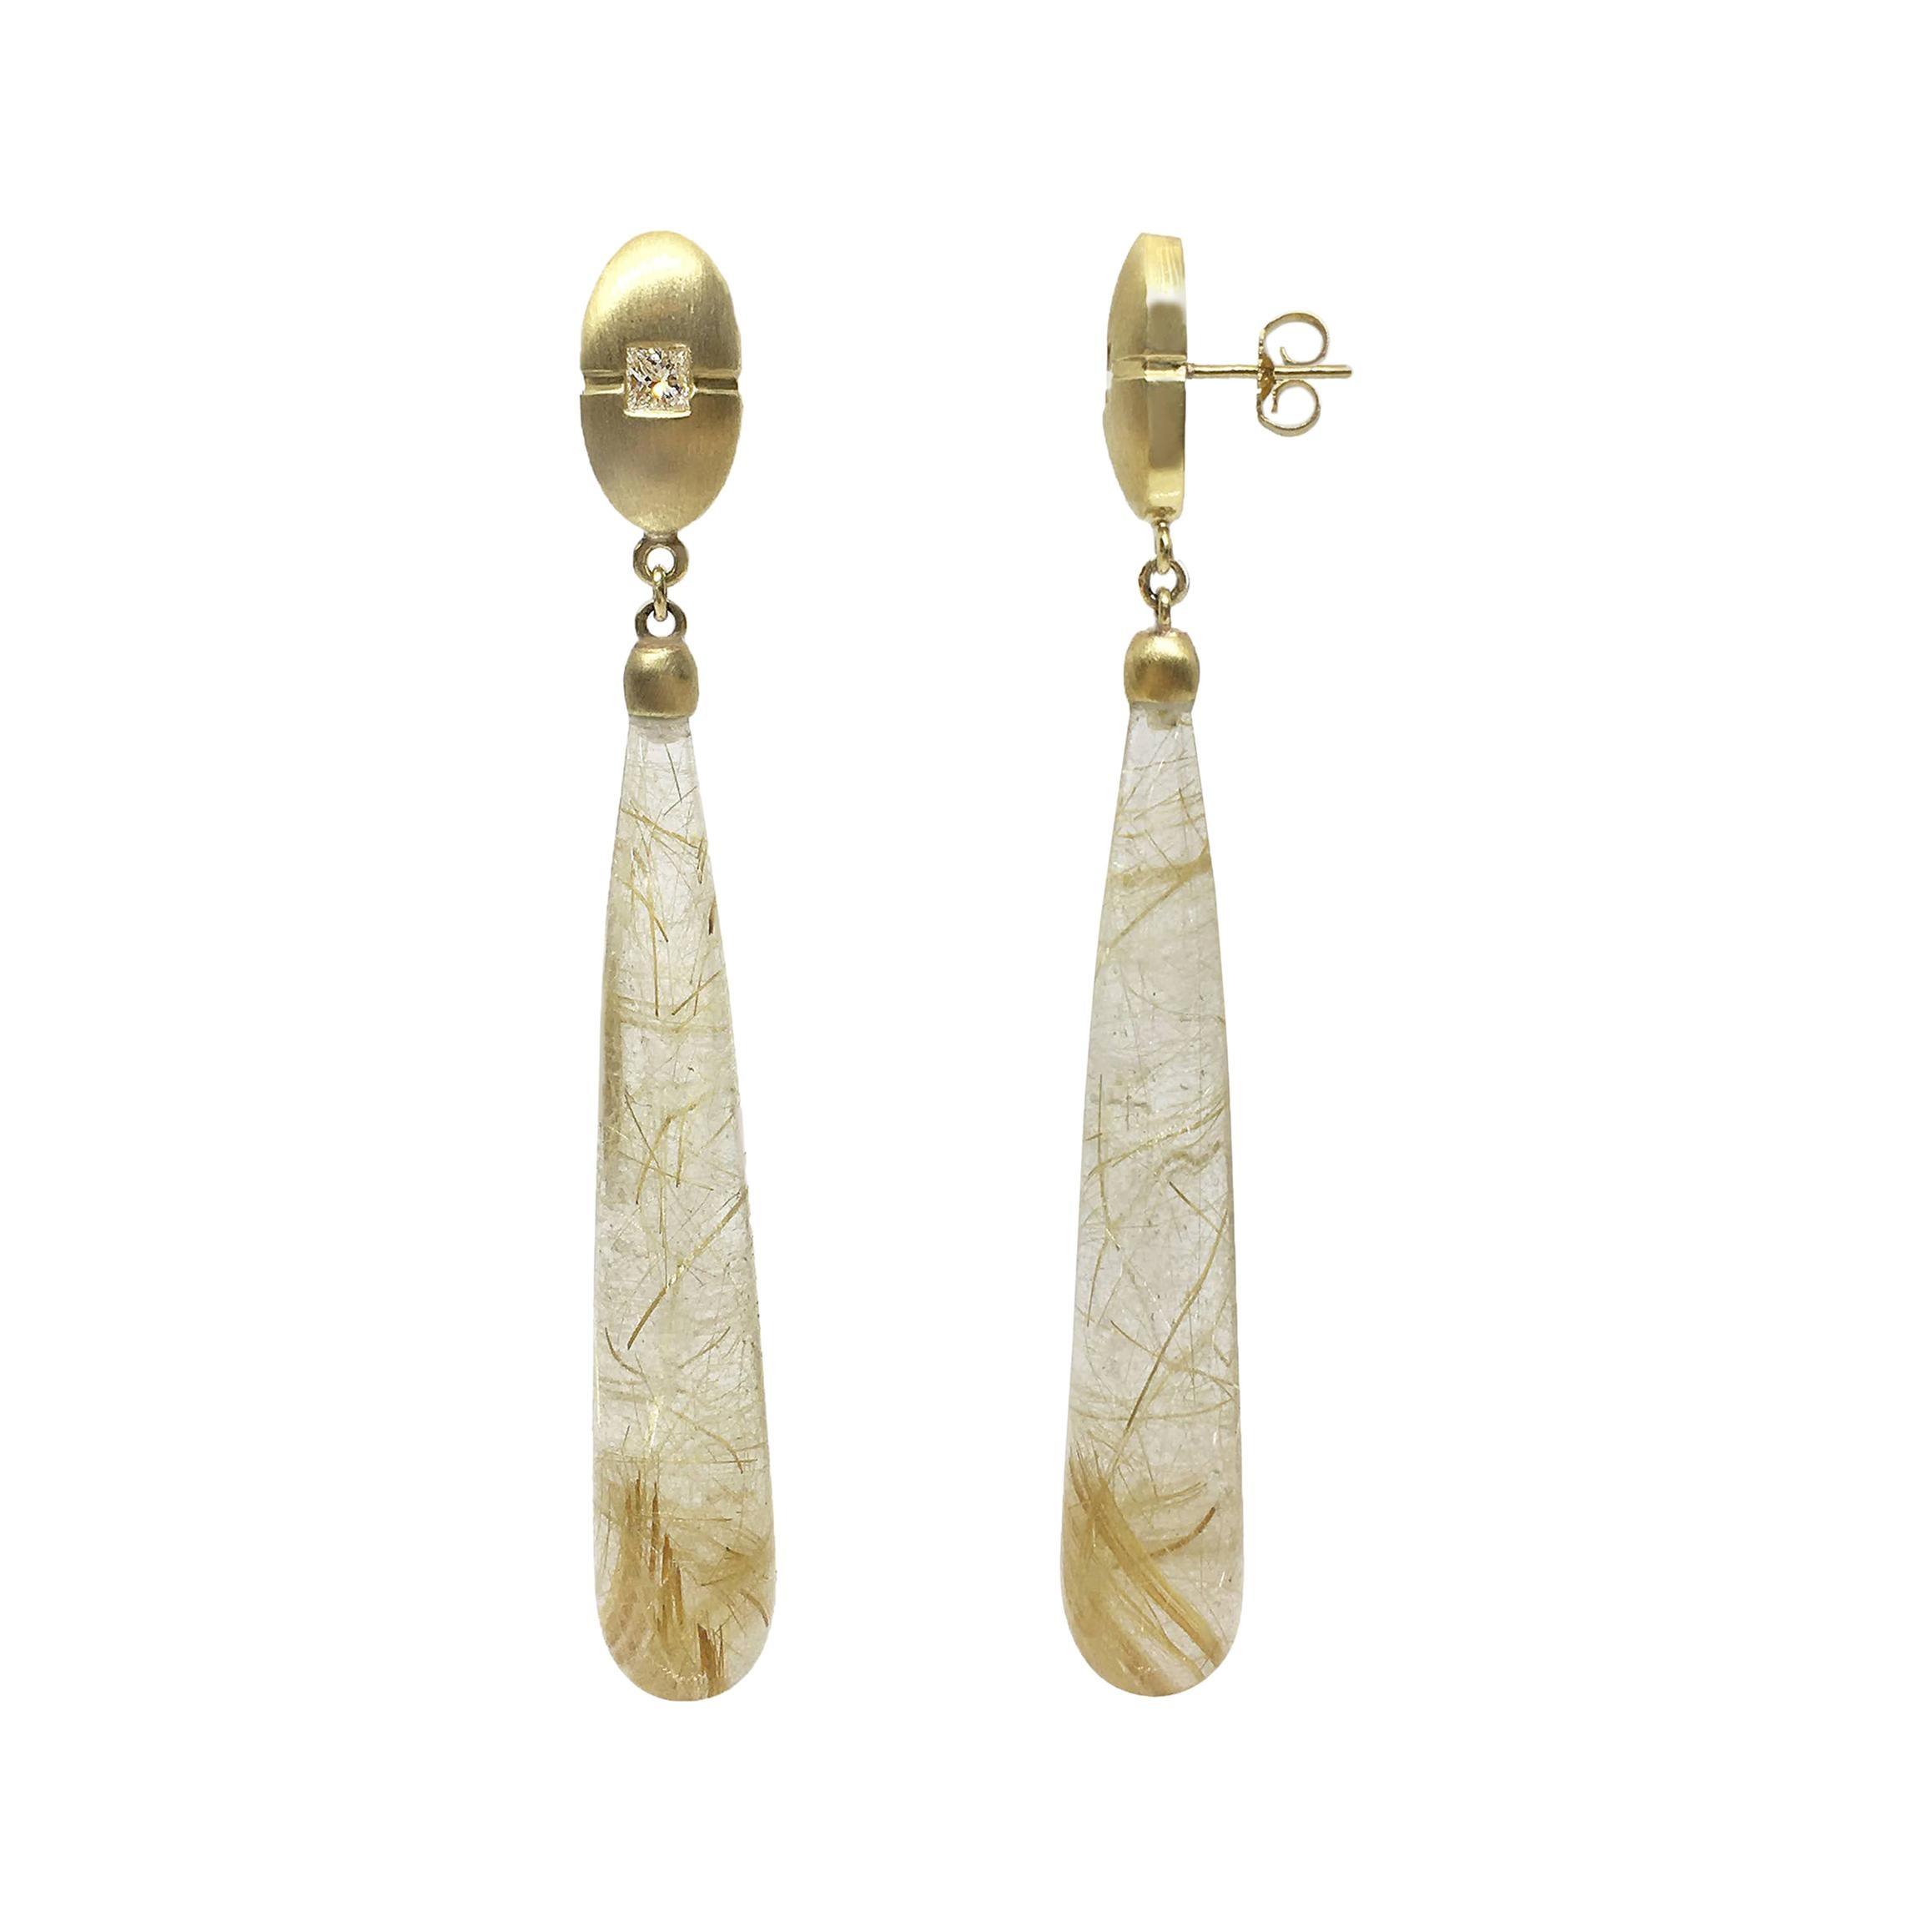 18k Gold and Rutilated Quartz Drop Earrings